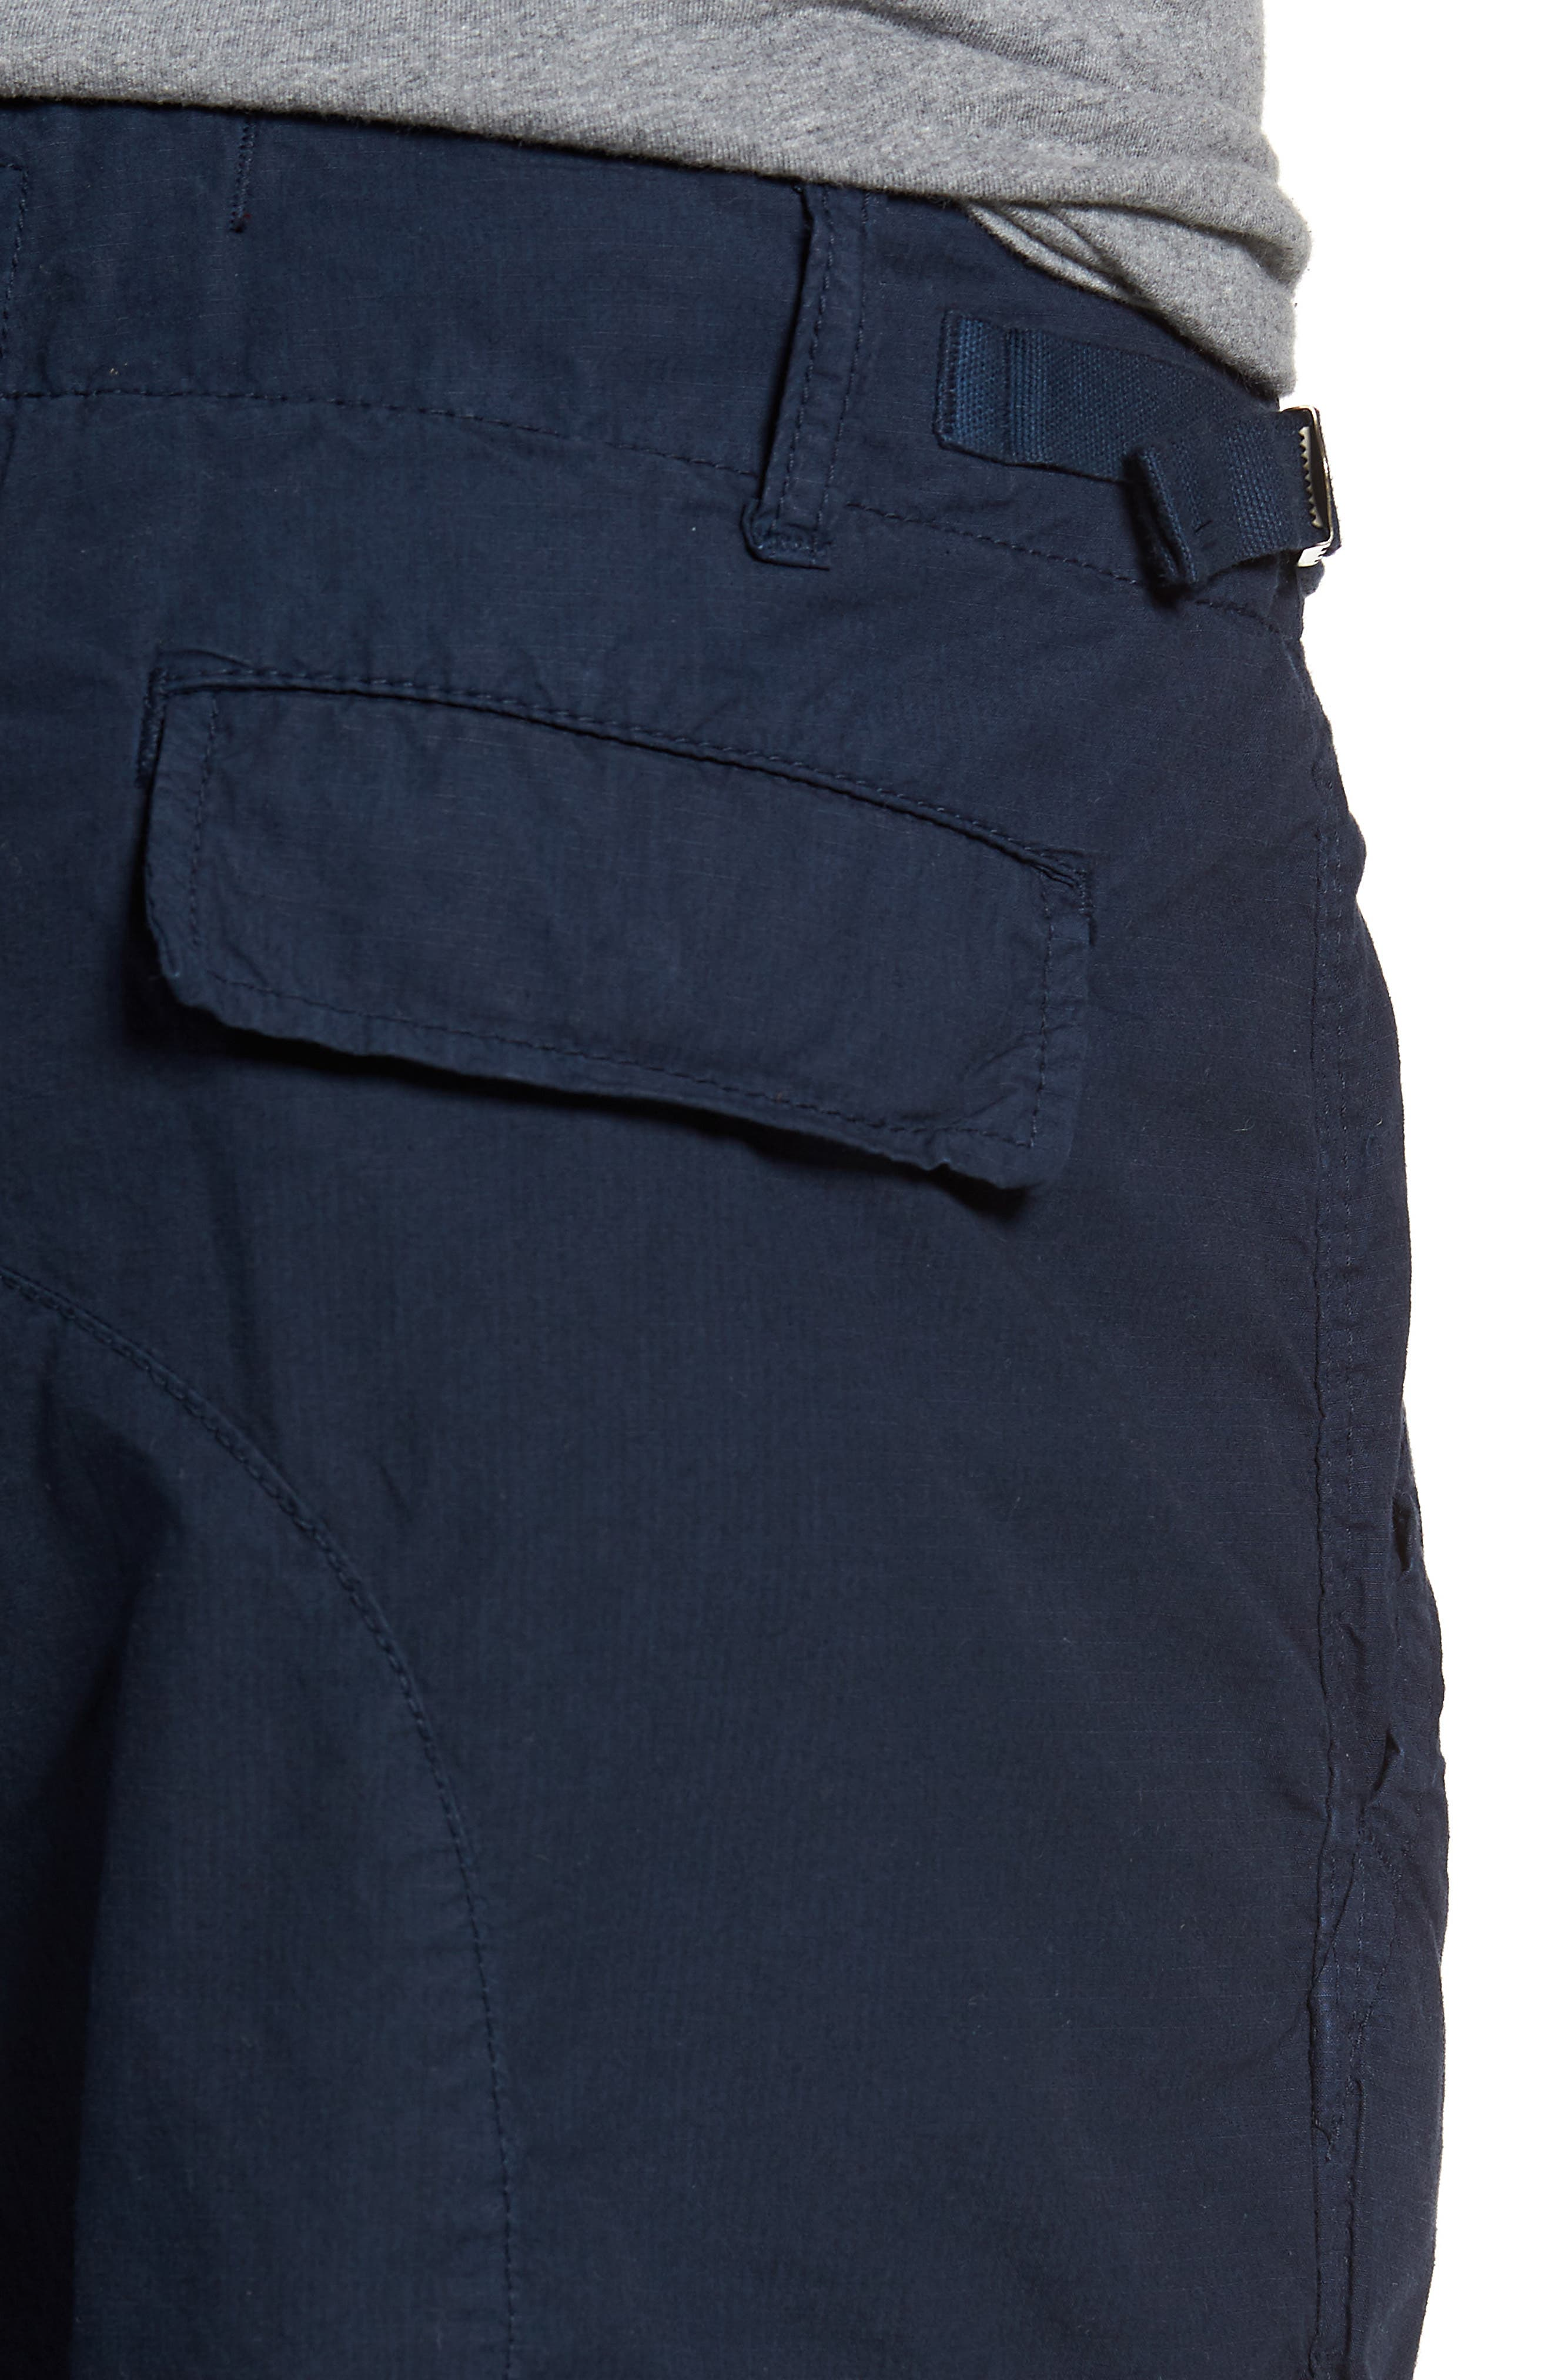 'Oxnard' Cargo Shorts,                             Alternate thumbnail 4, color,                             Navy